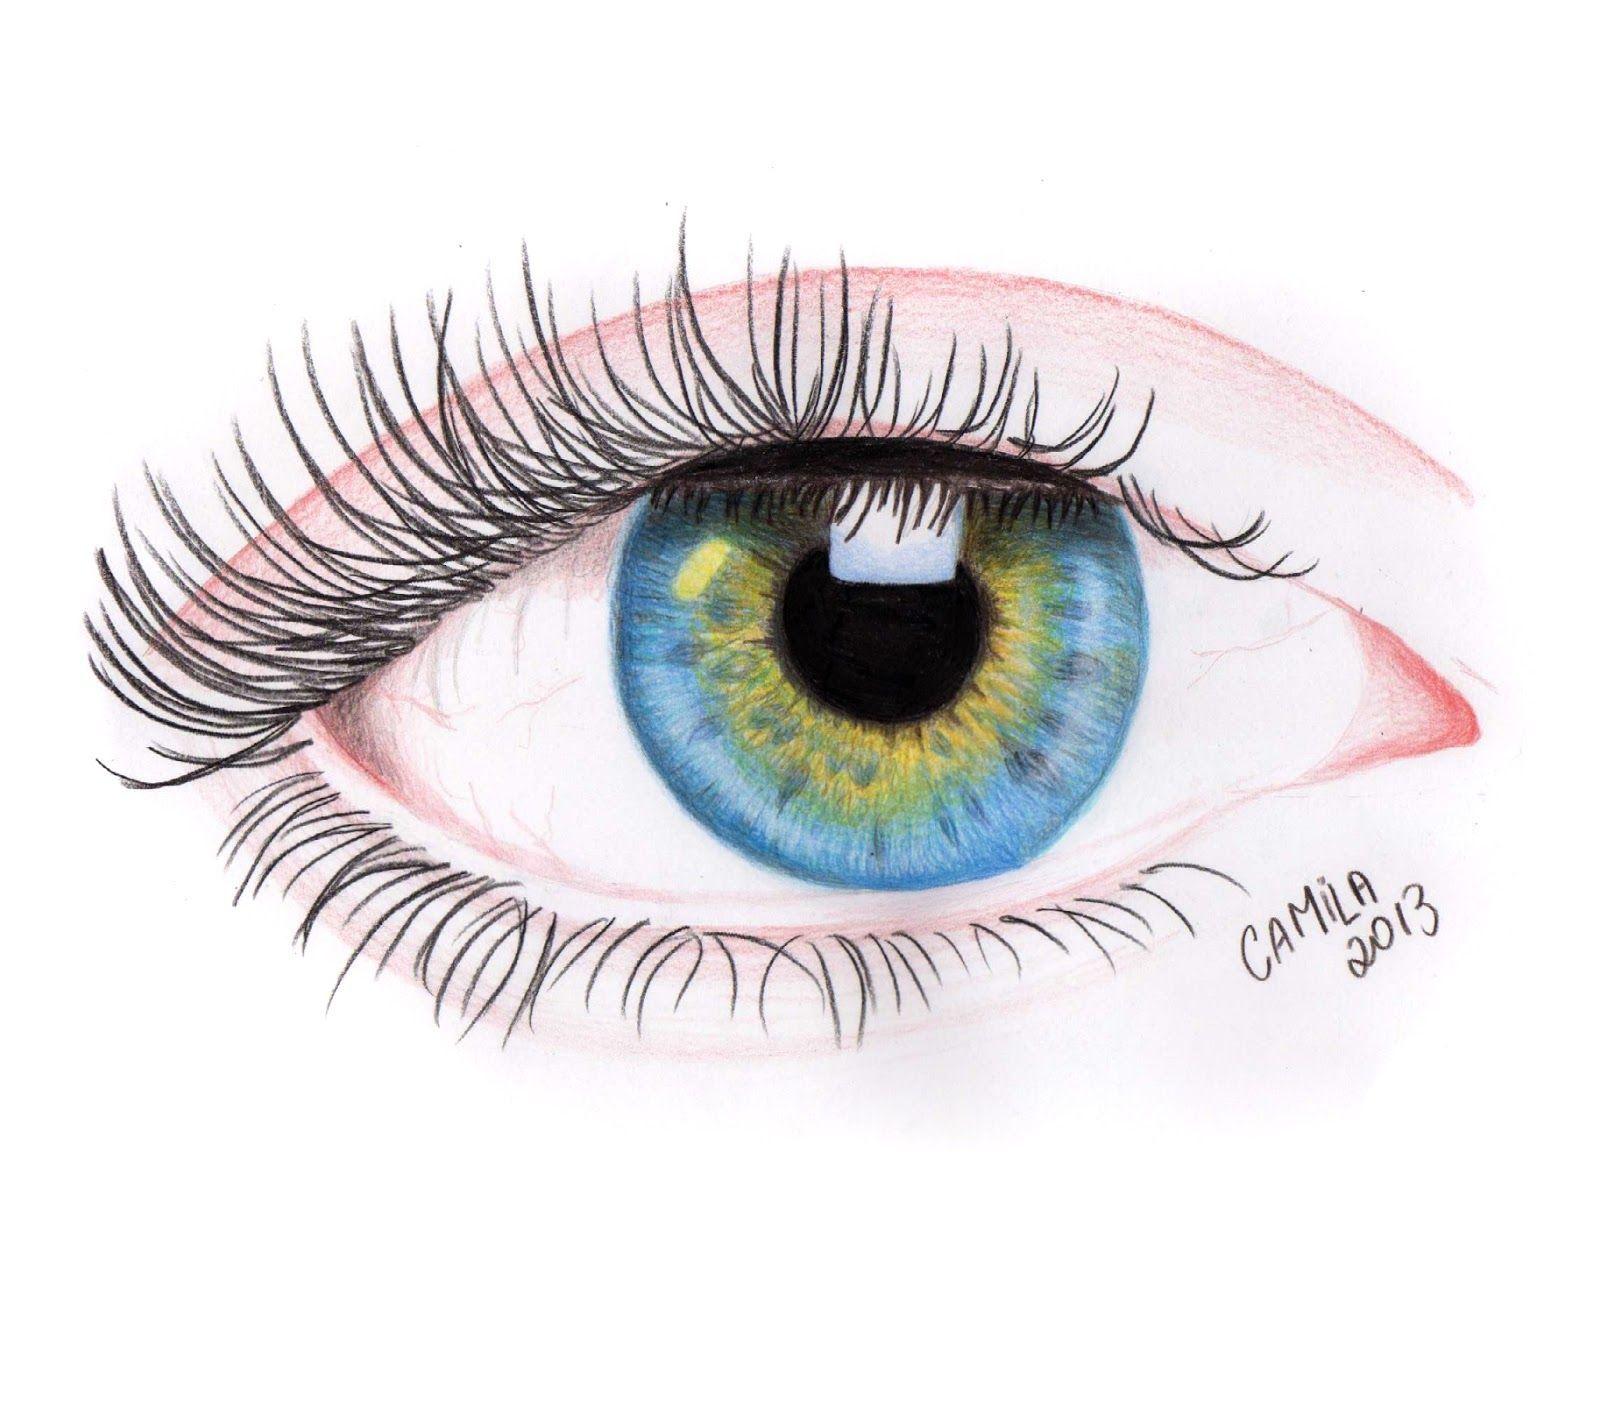 Pin De Socorro Em Olhos Desenhos Realistas Olhos Coloridos